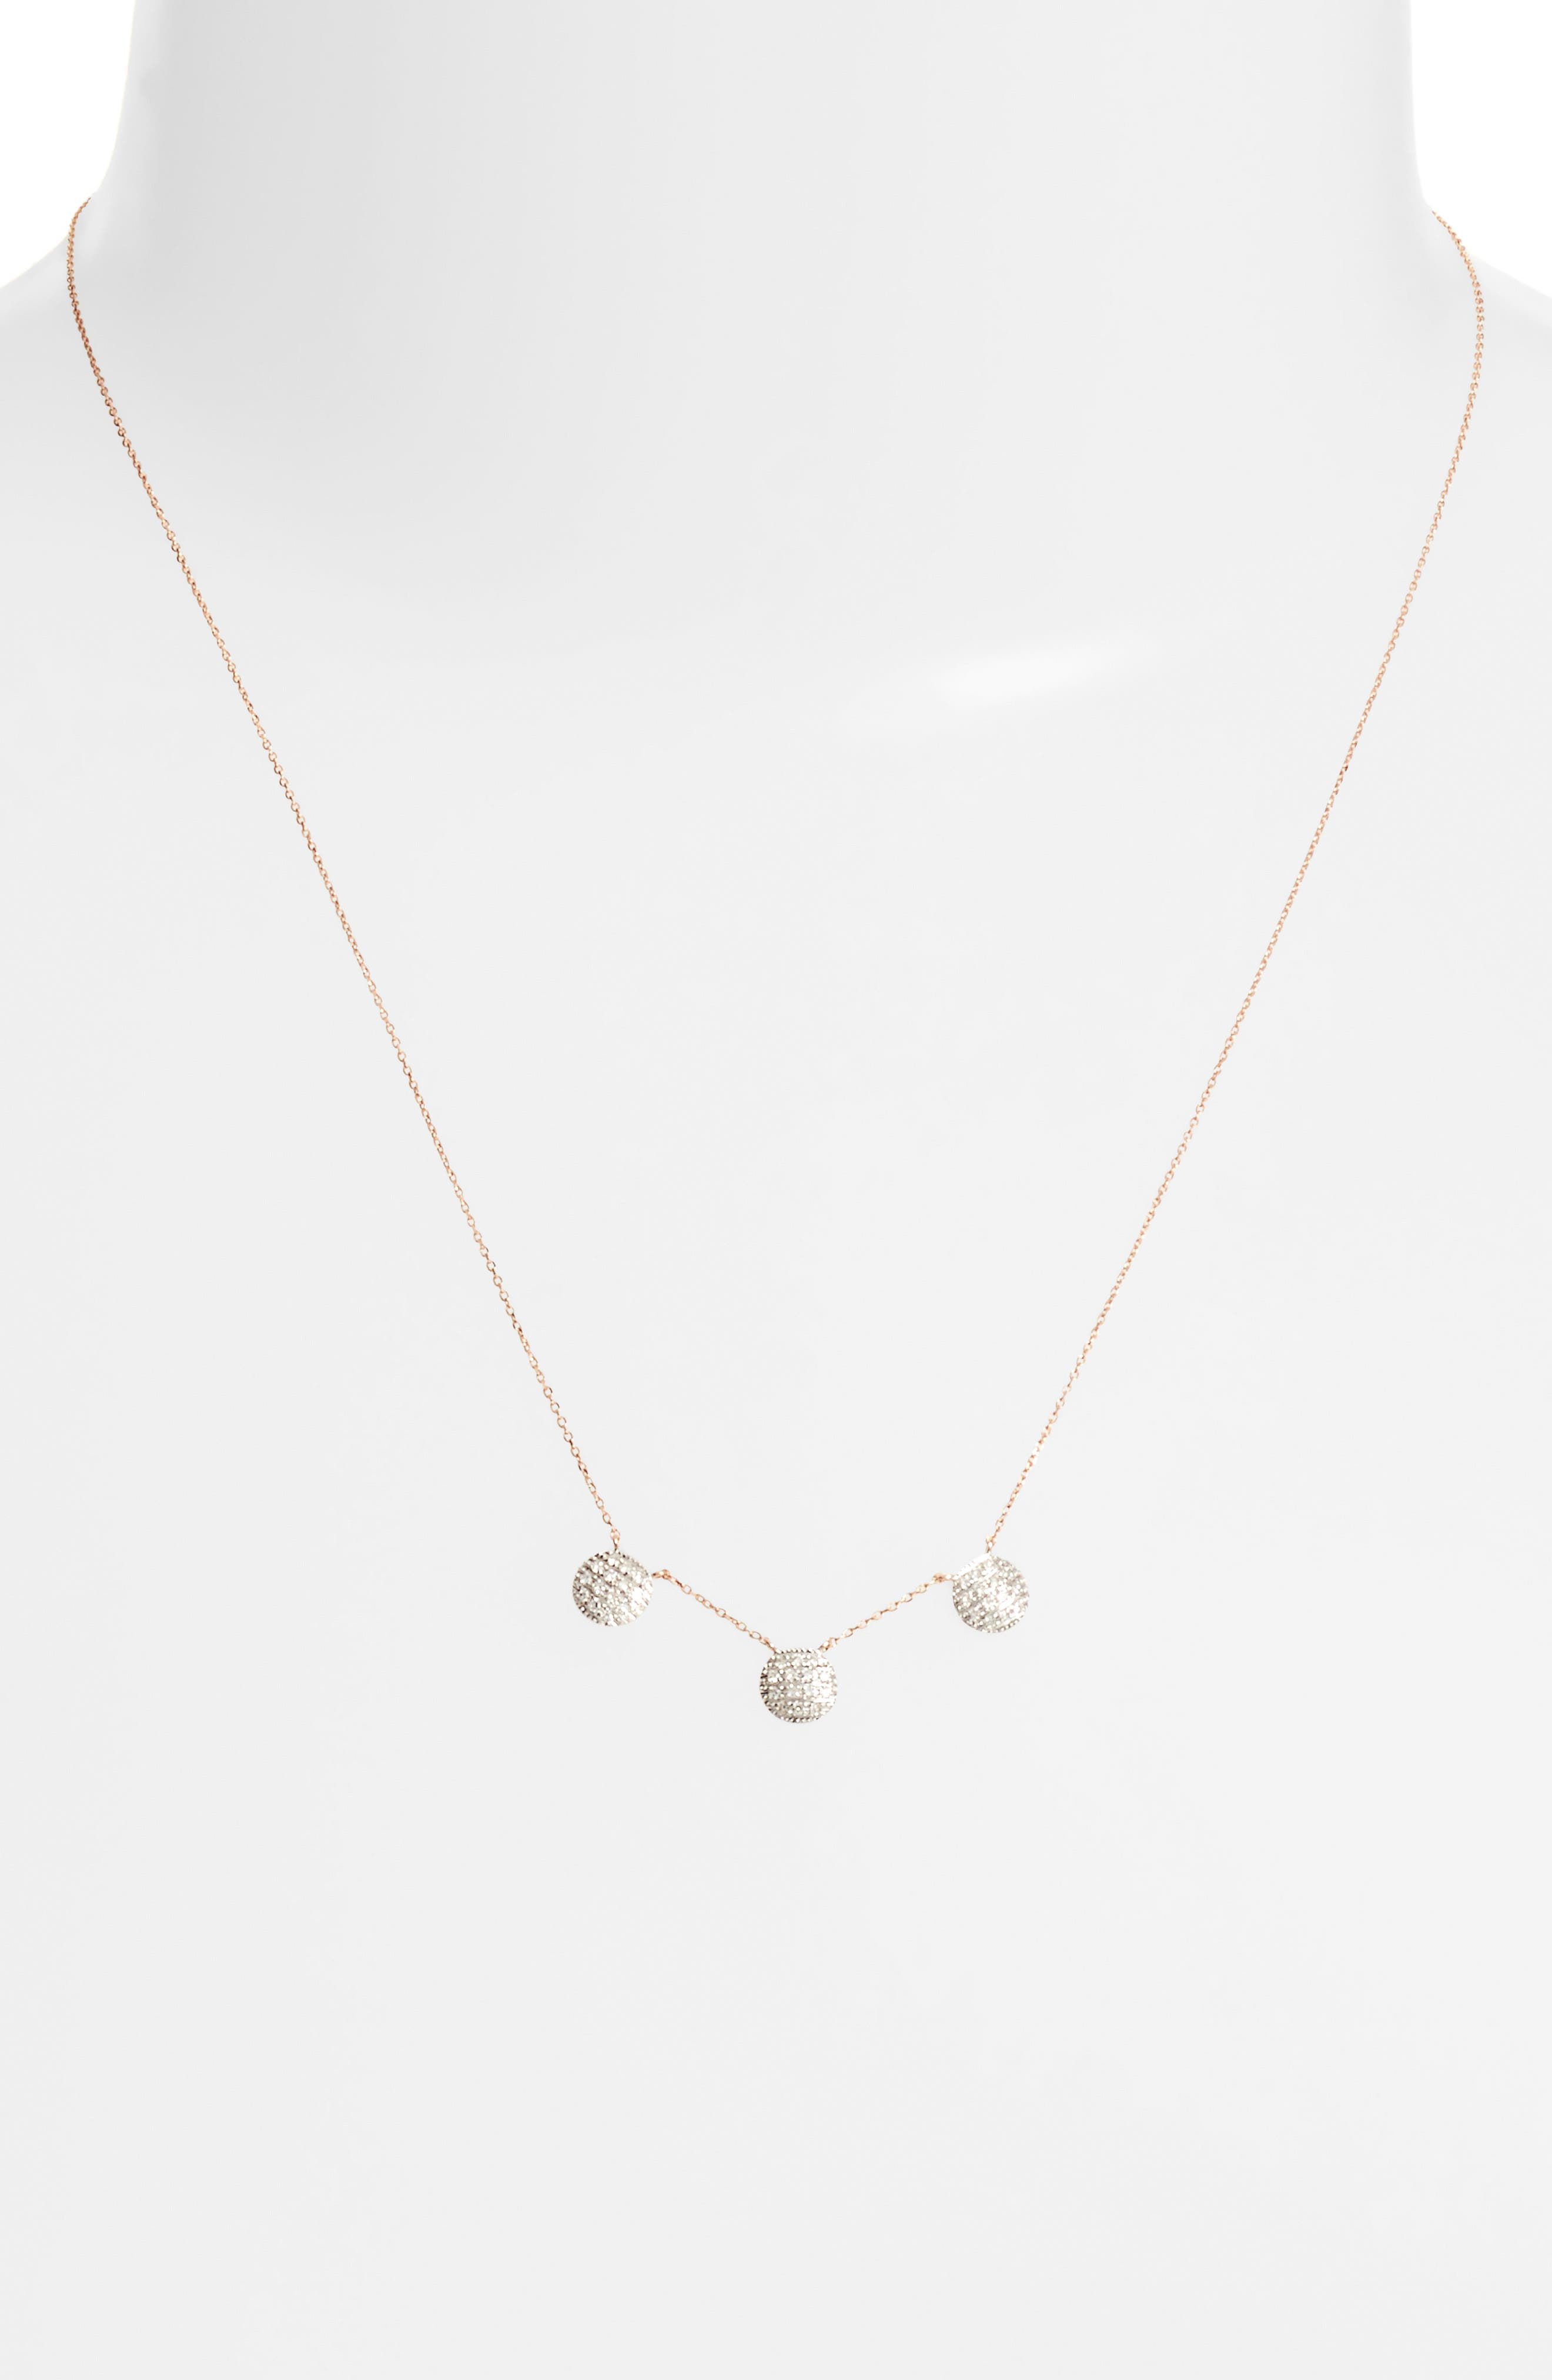 Lauren Joy Three-Disc Diamond Necklace,                             Alternate thumbnail 6, color,